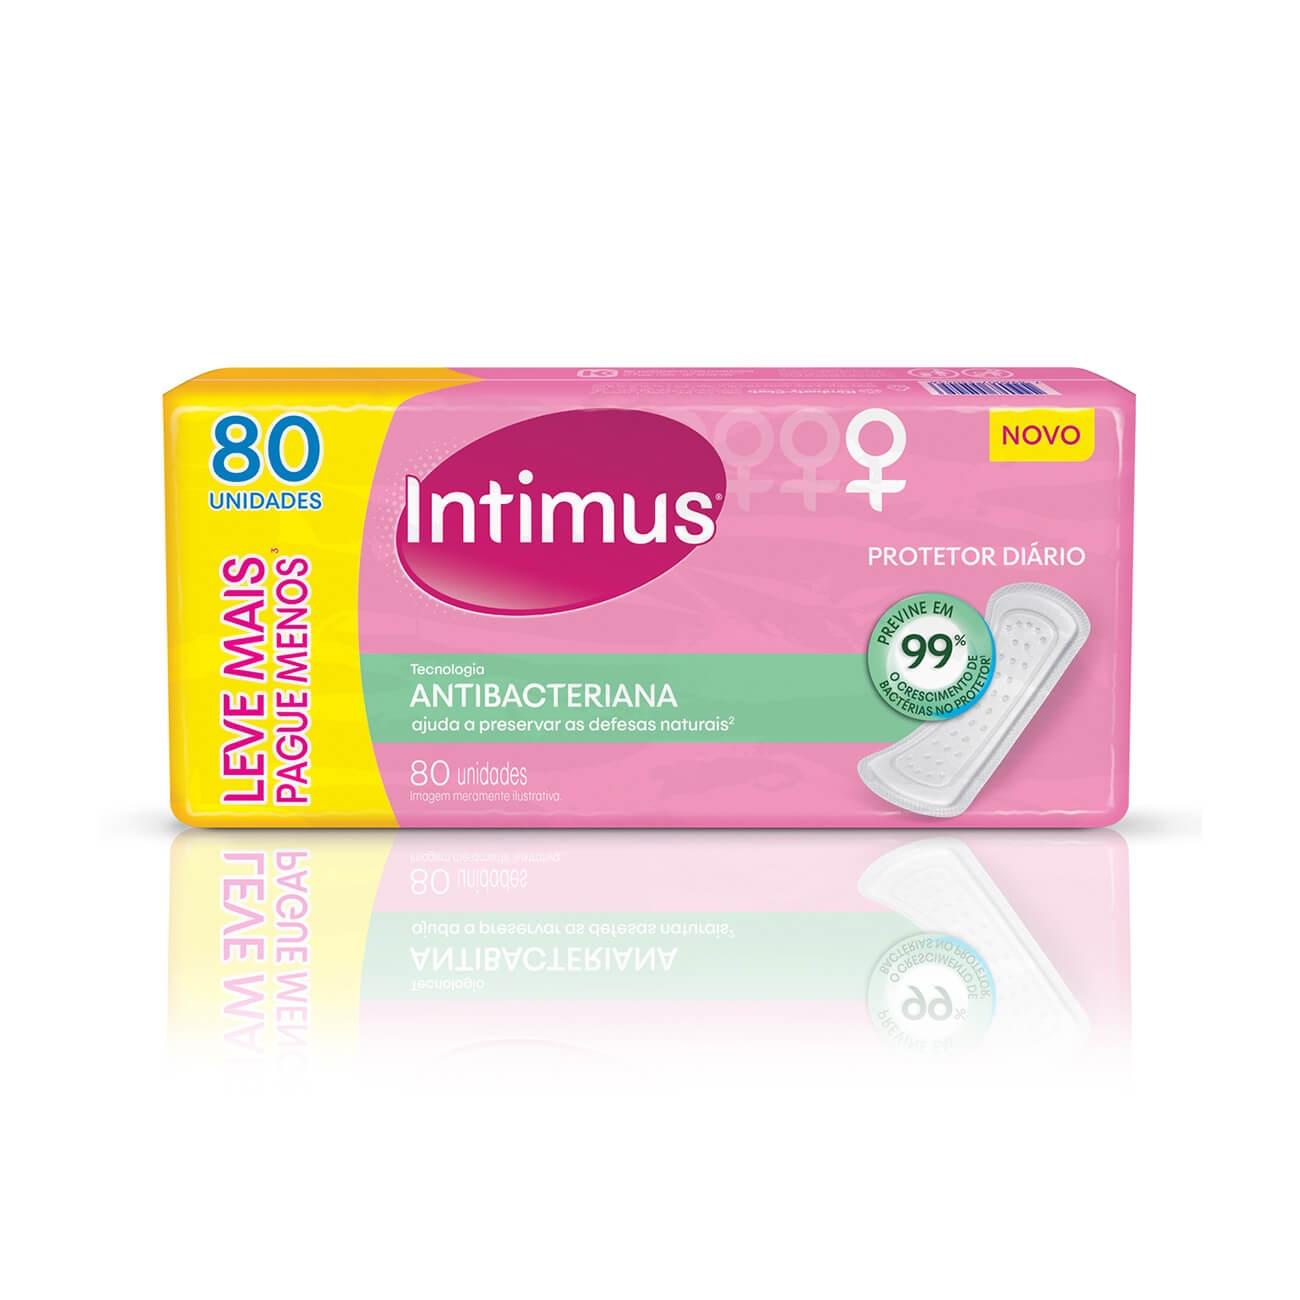 Protetor Diário Intimus Antibacteriana 80un